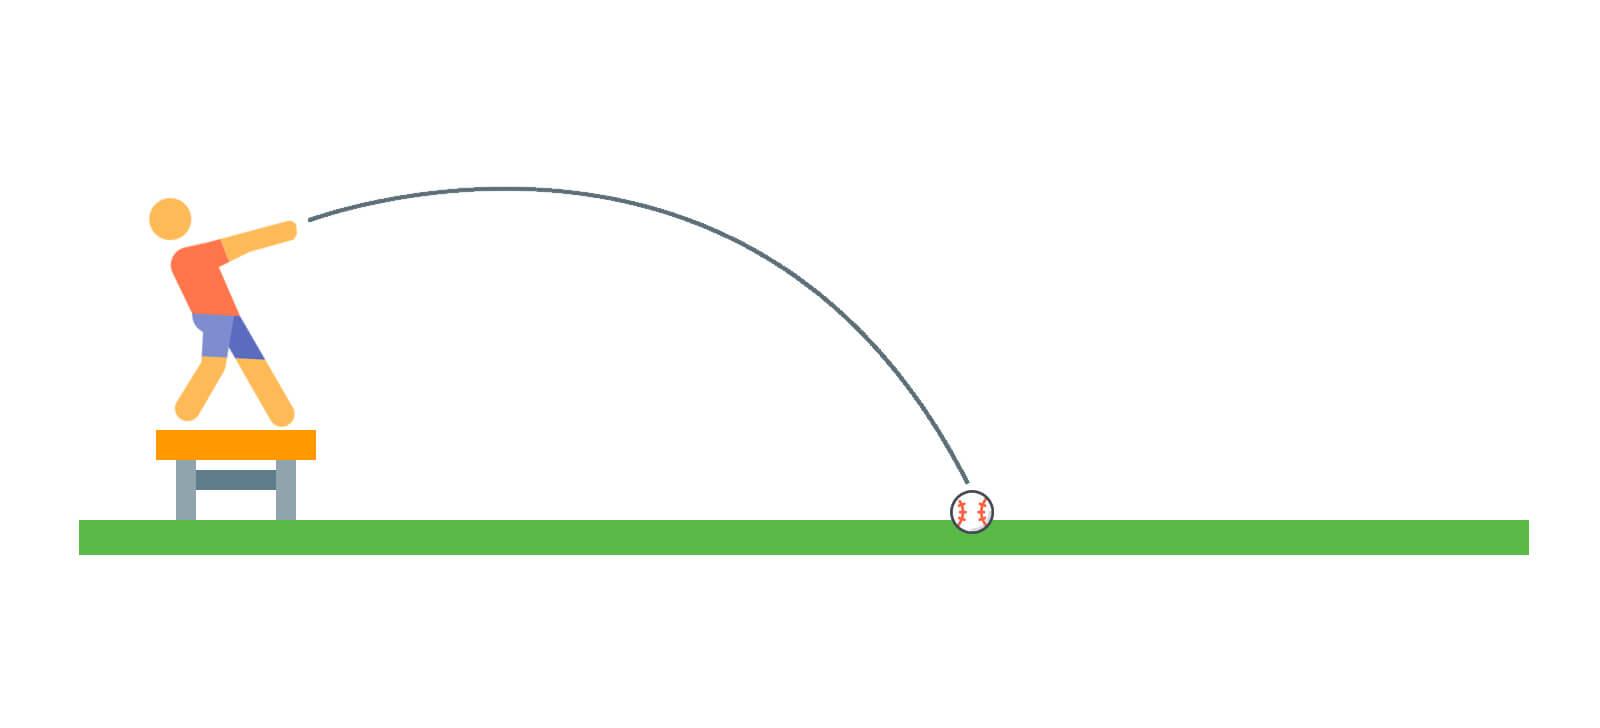 Ball Throw Example 1